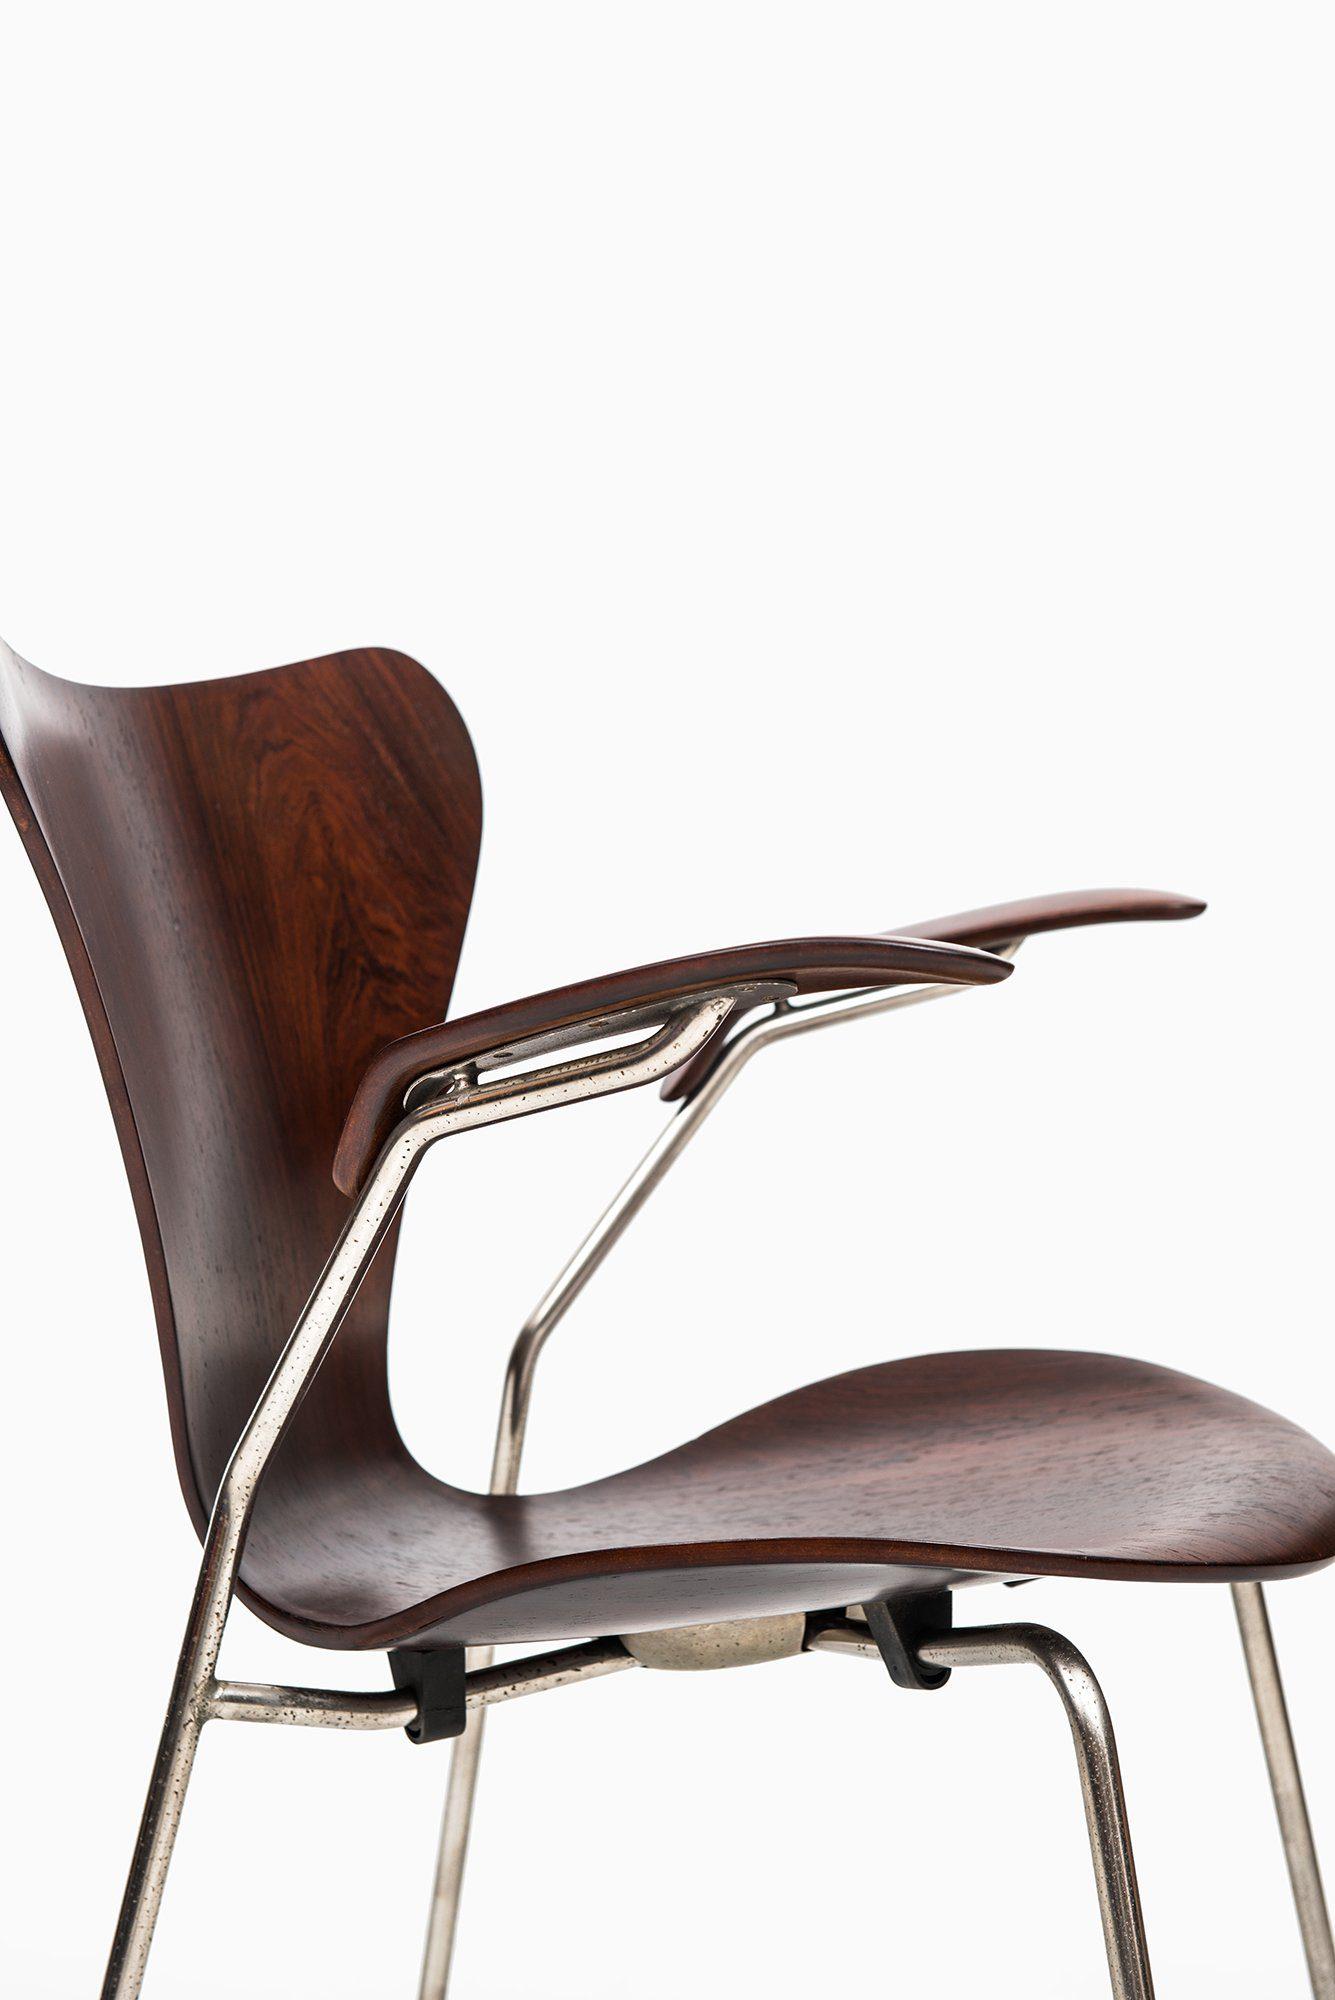 Arne Jacobsen Dining Chairs Model 3107 Amp 3207 At Studio